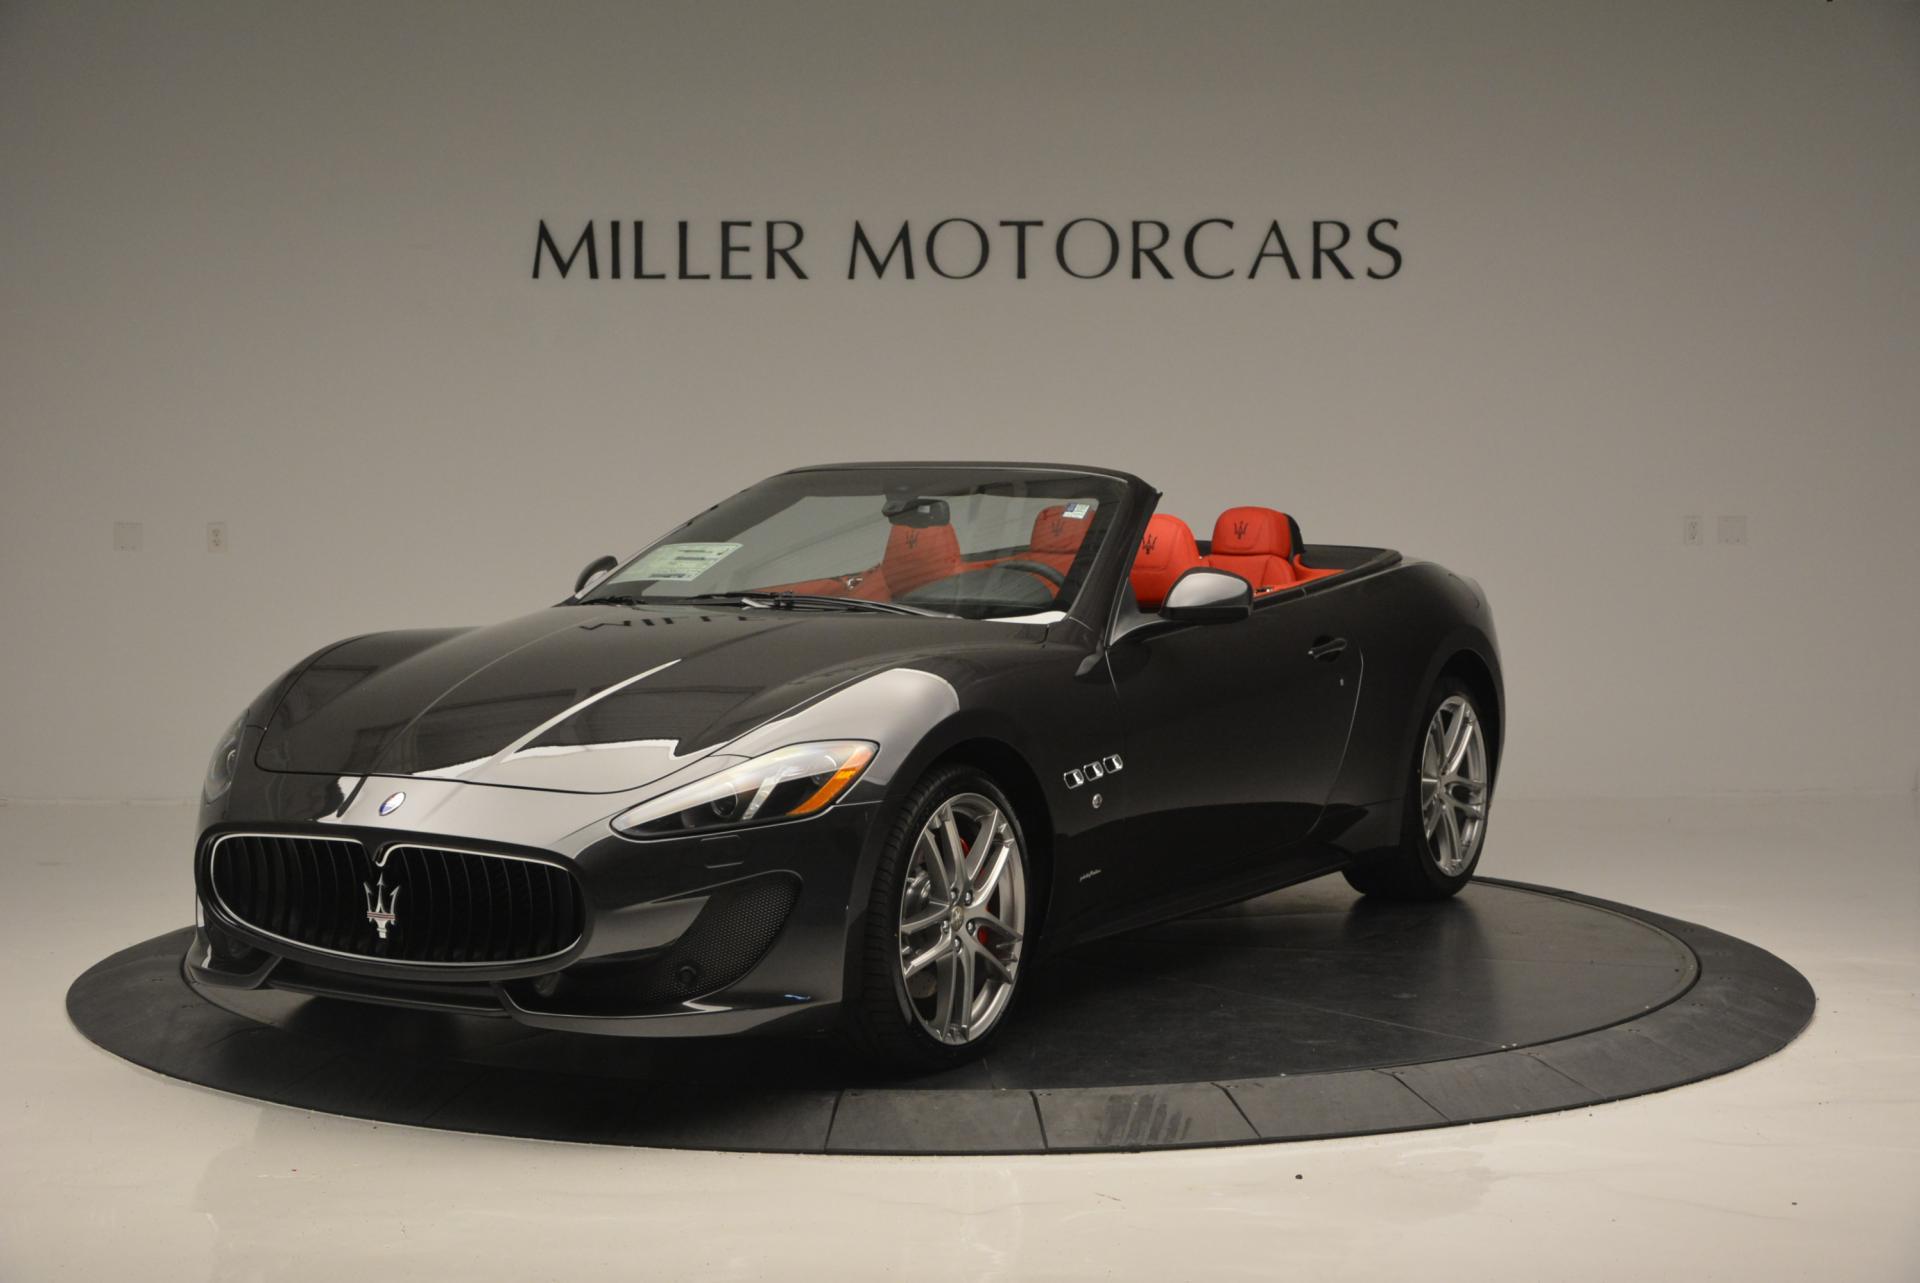 New 2017 Maserati GranTurismo Convertible Sport For Sale In Westport, CT 156_main